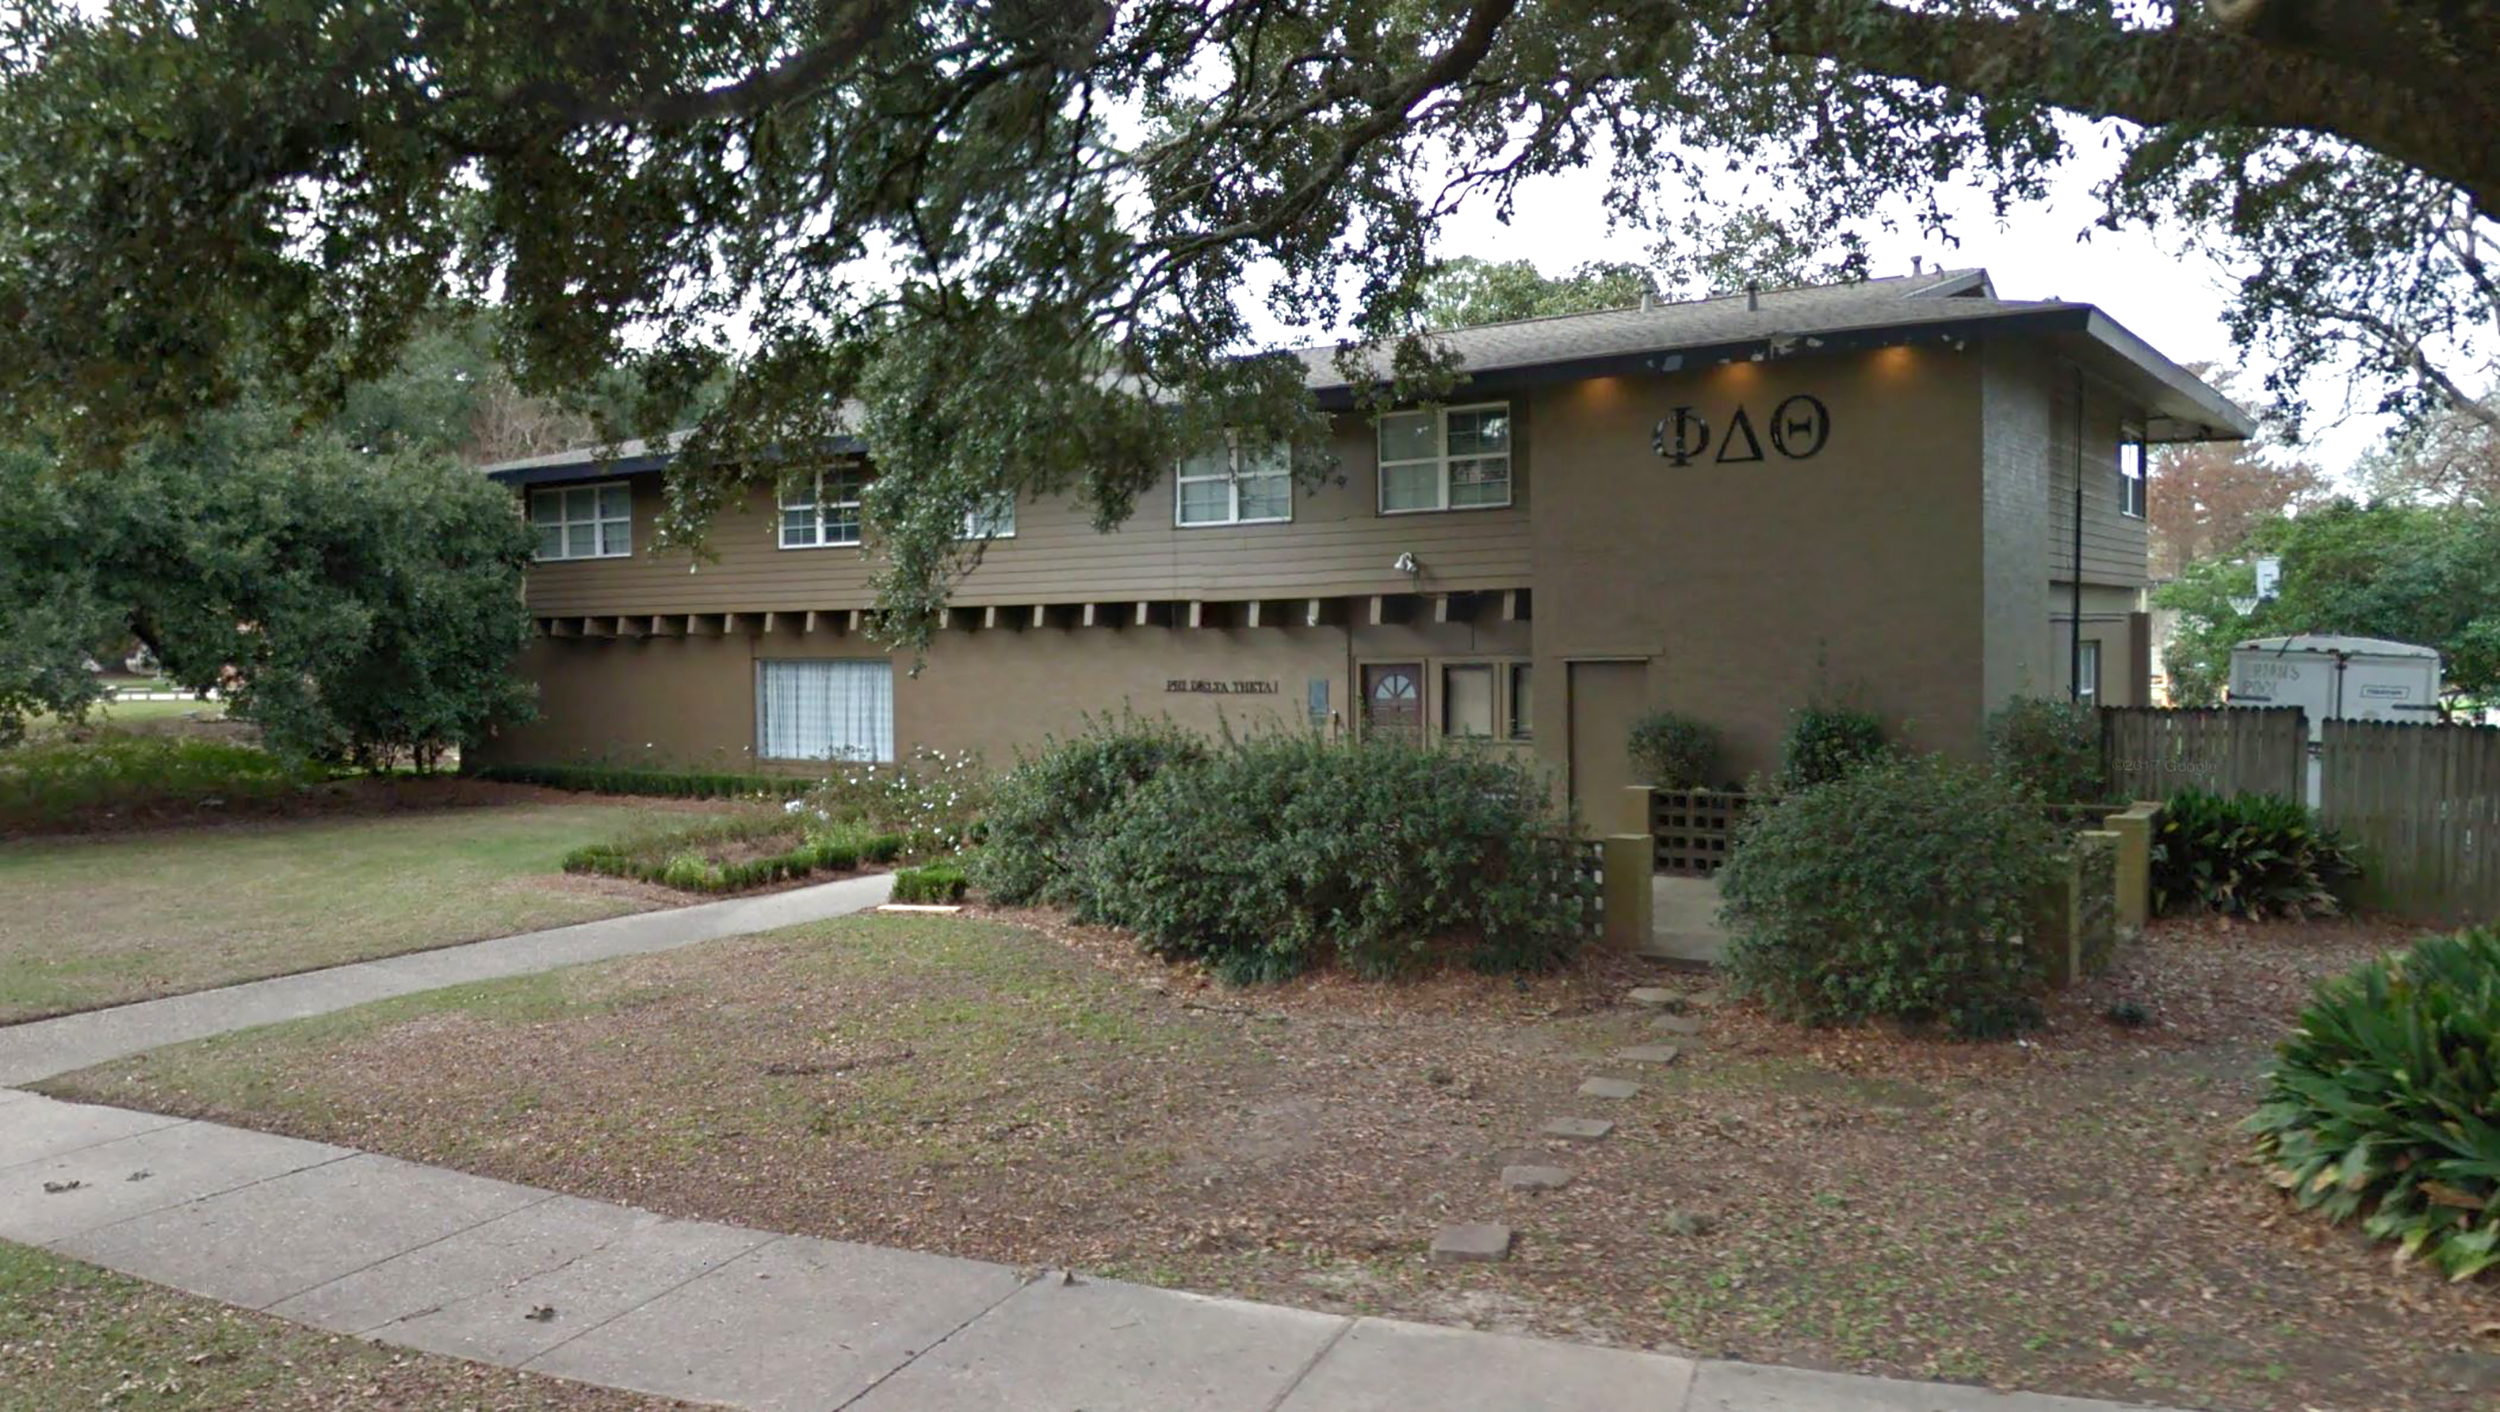 Image: Phi Delta Theta fraternity at LSU